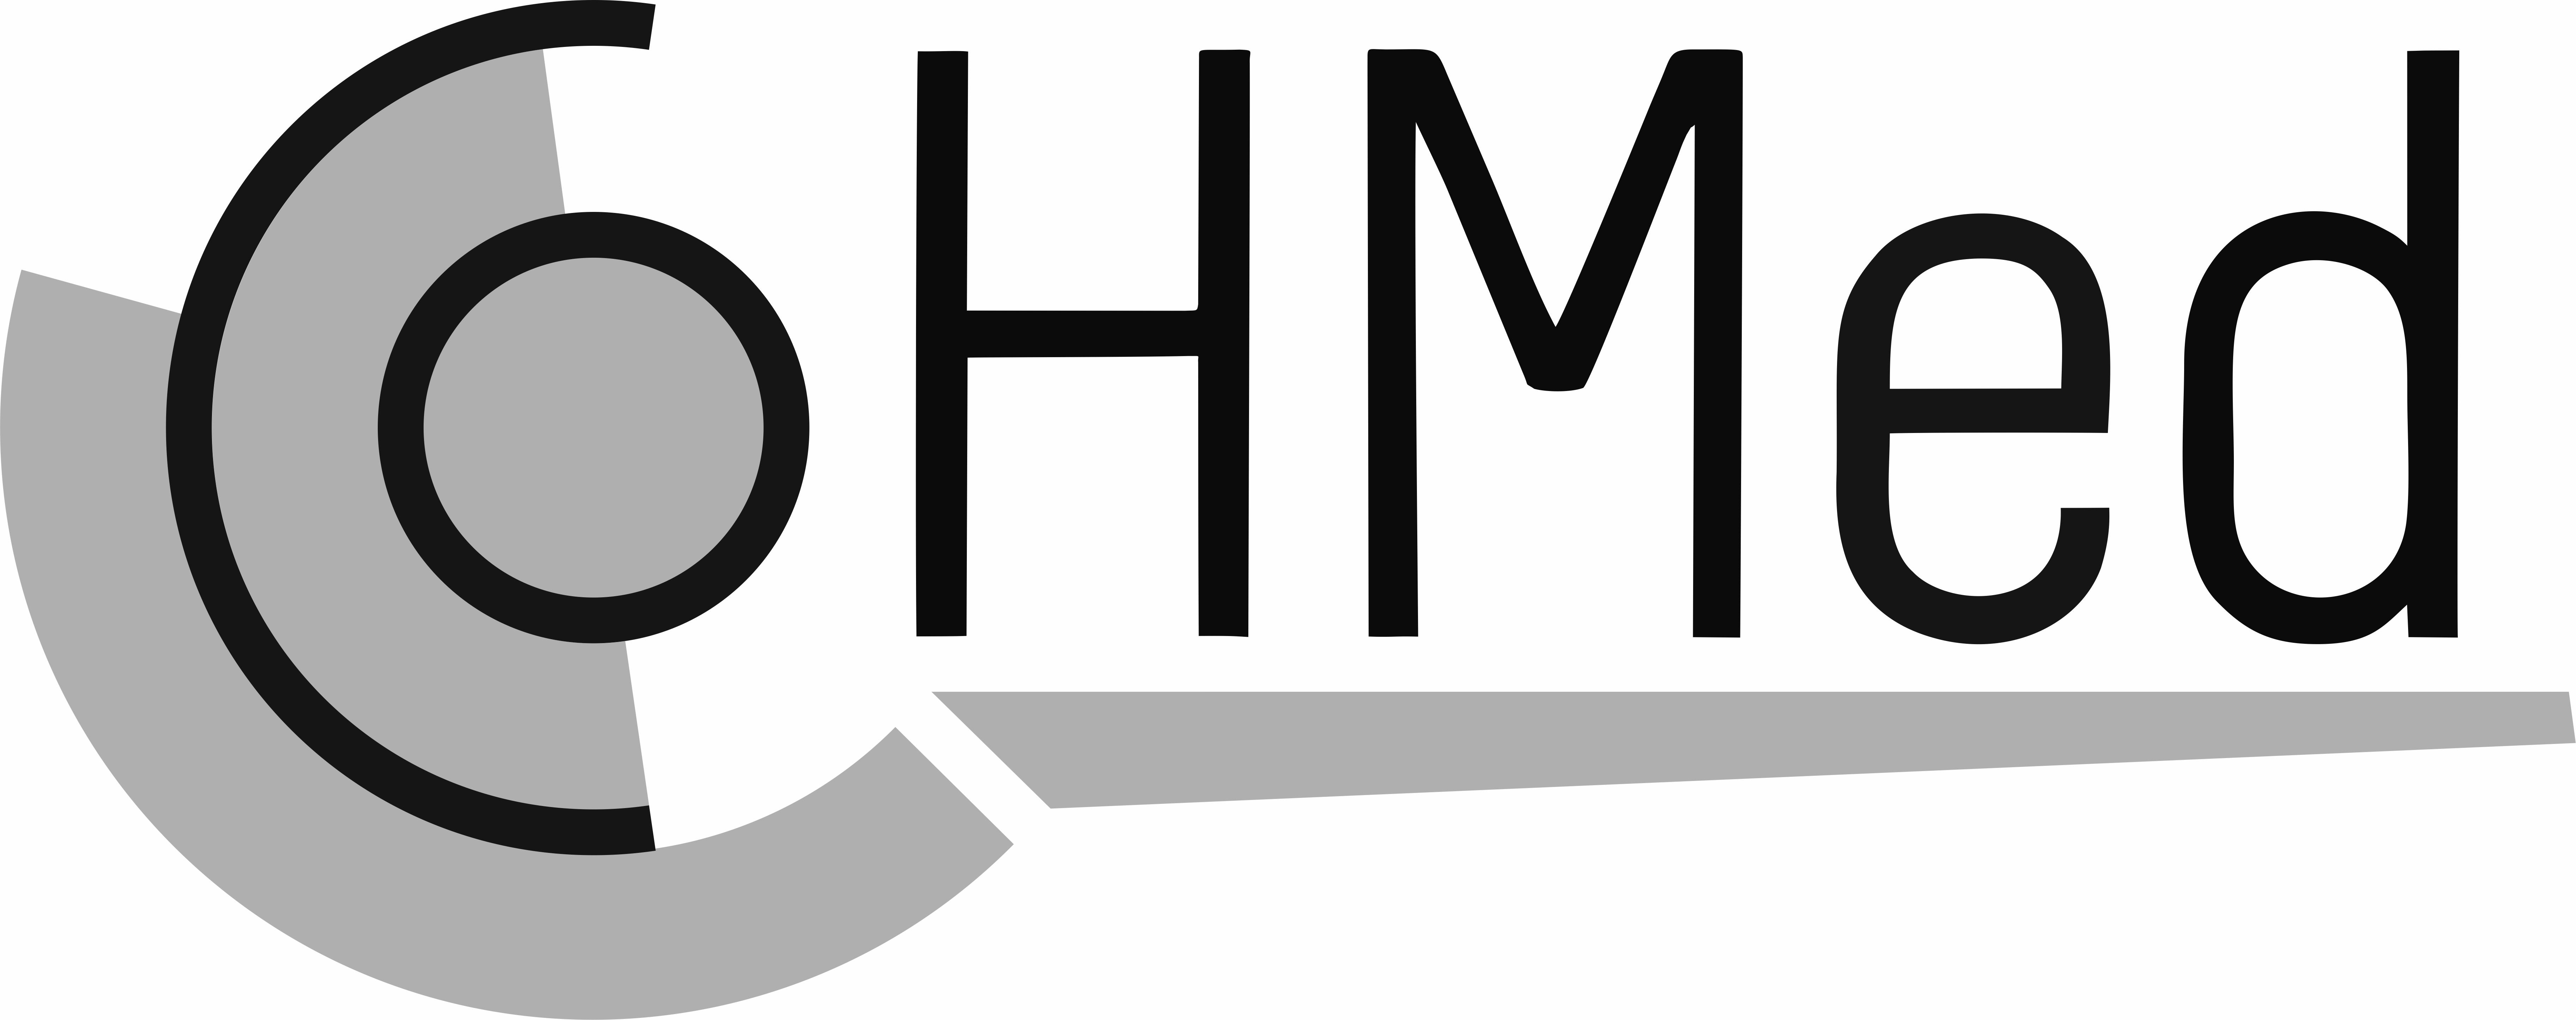 CoHMed (I14247)